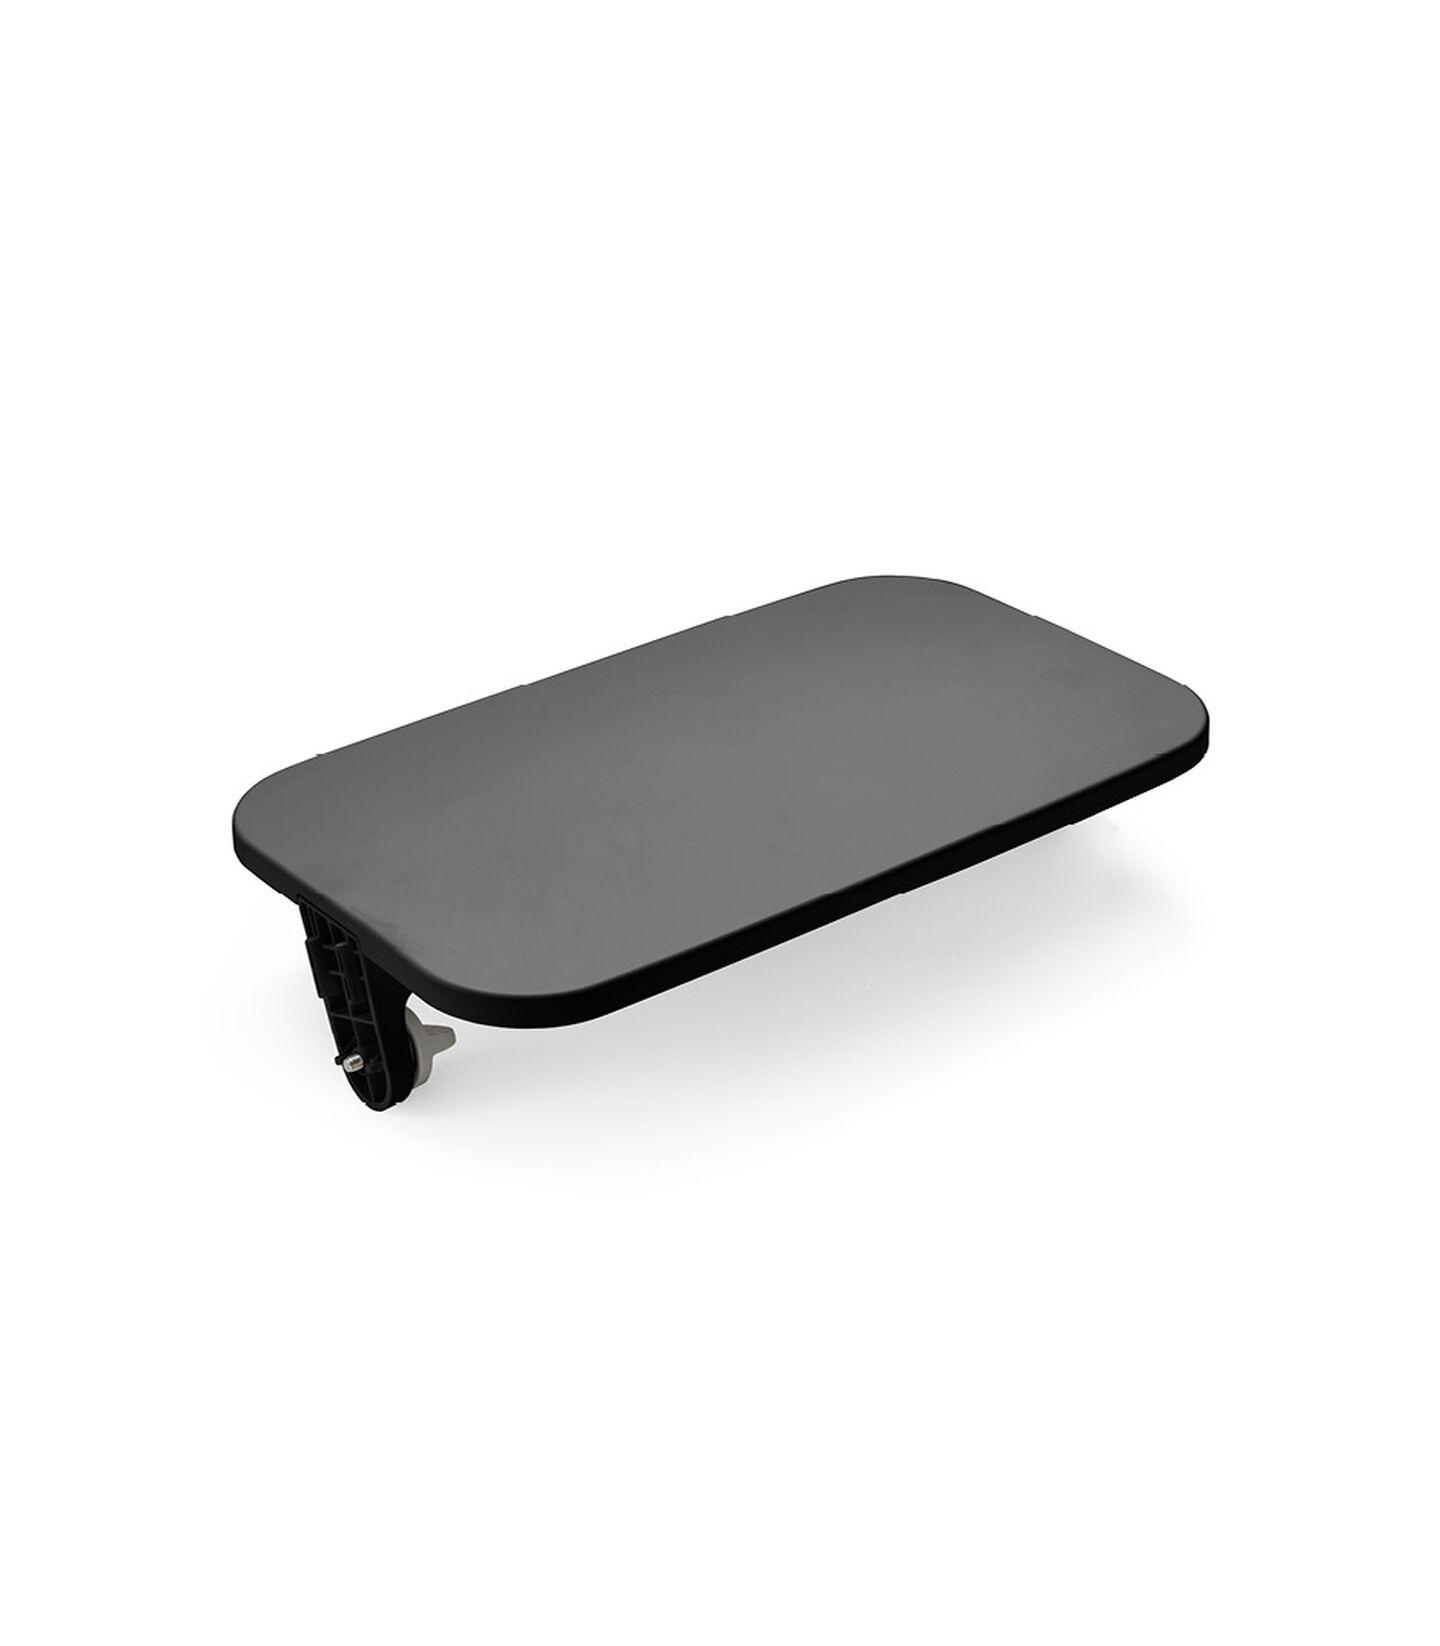 Stokke® Steps™ Chair Footrest Black, Black, mainview view 1